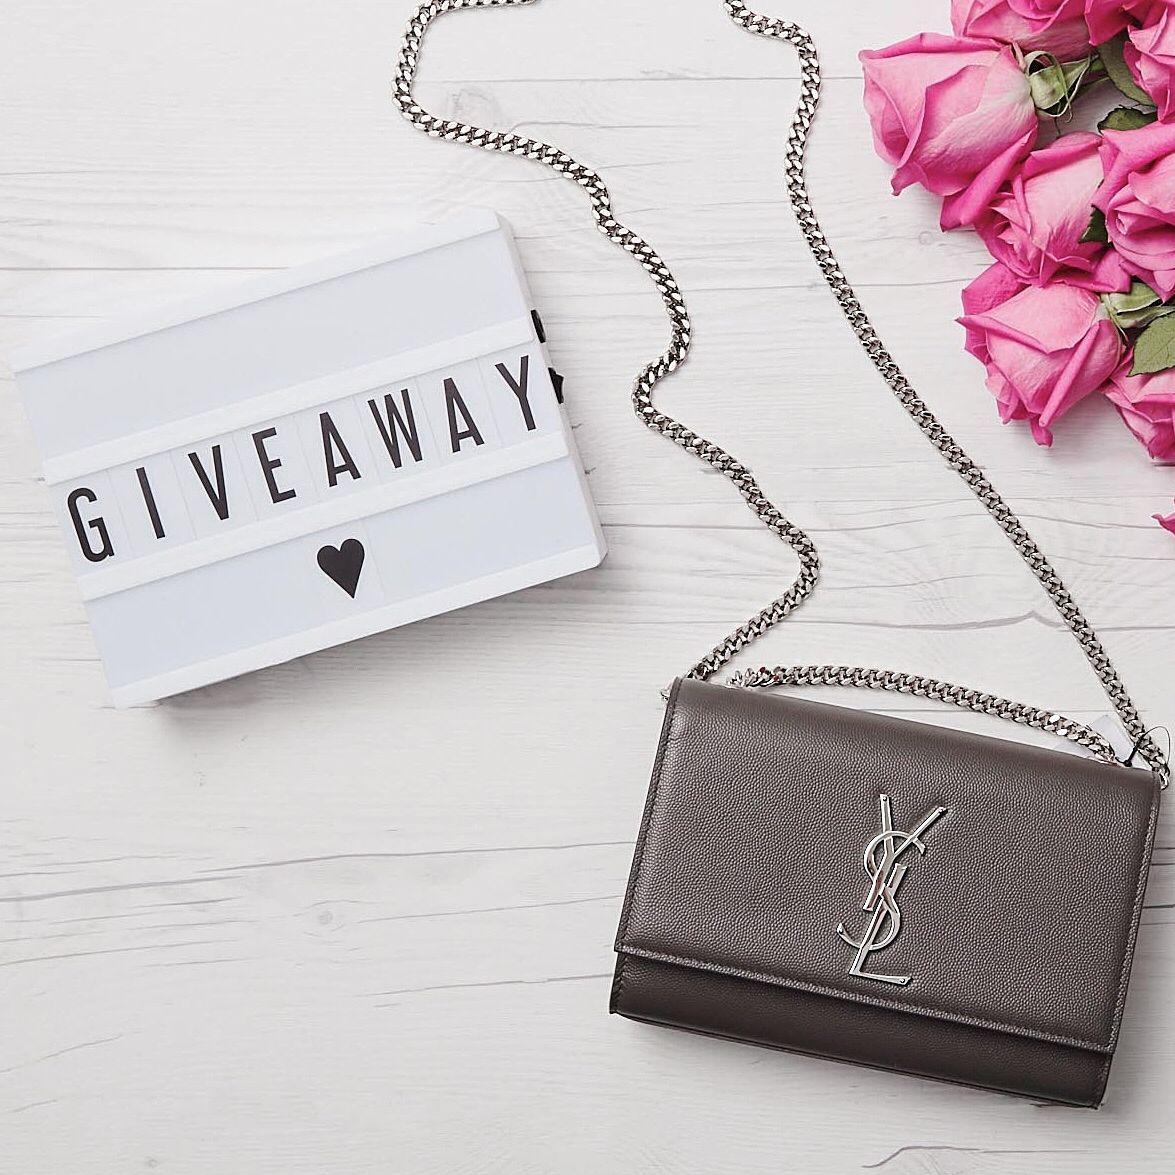 Saint Laurent bag GIVEAWAY!  YSL  SaintLaurent  bags  giveaway   yoogiscloset   40f100c617